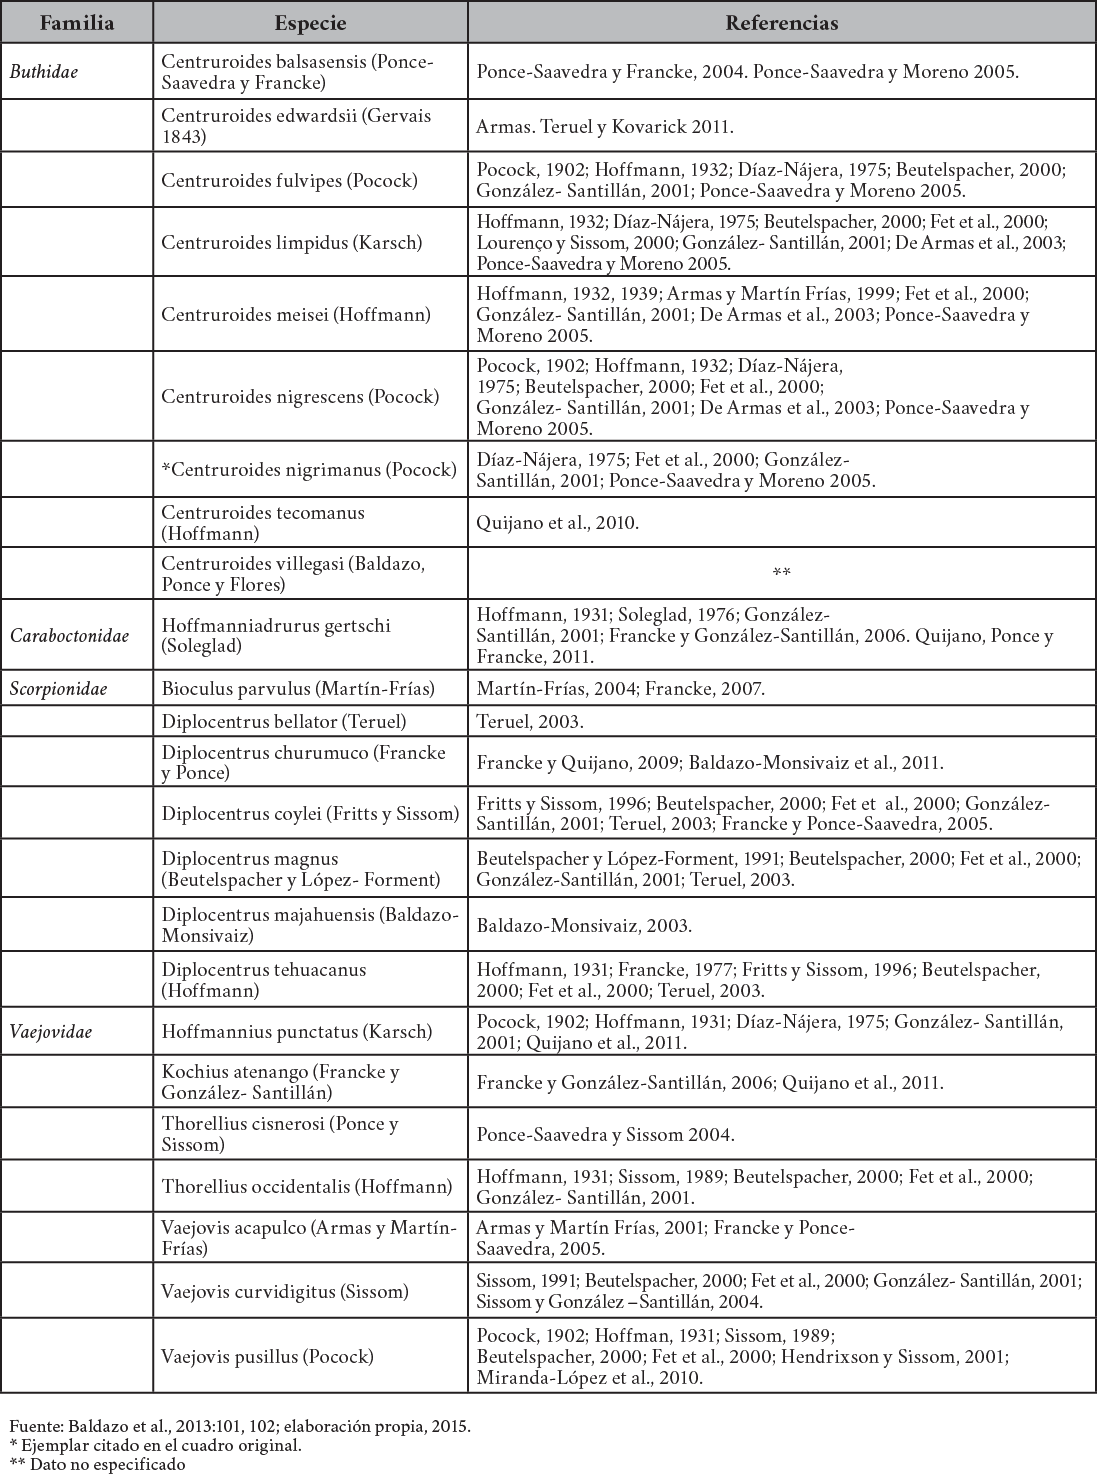 geodialacmexb59-c1